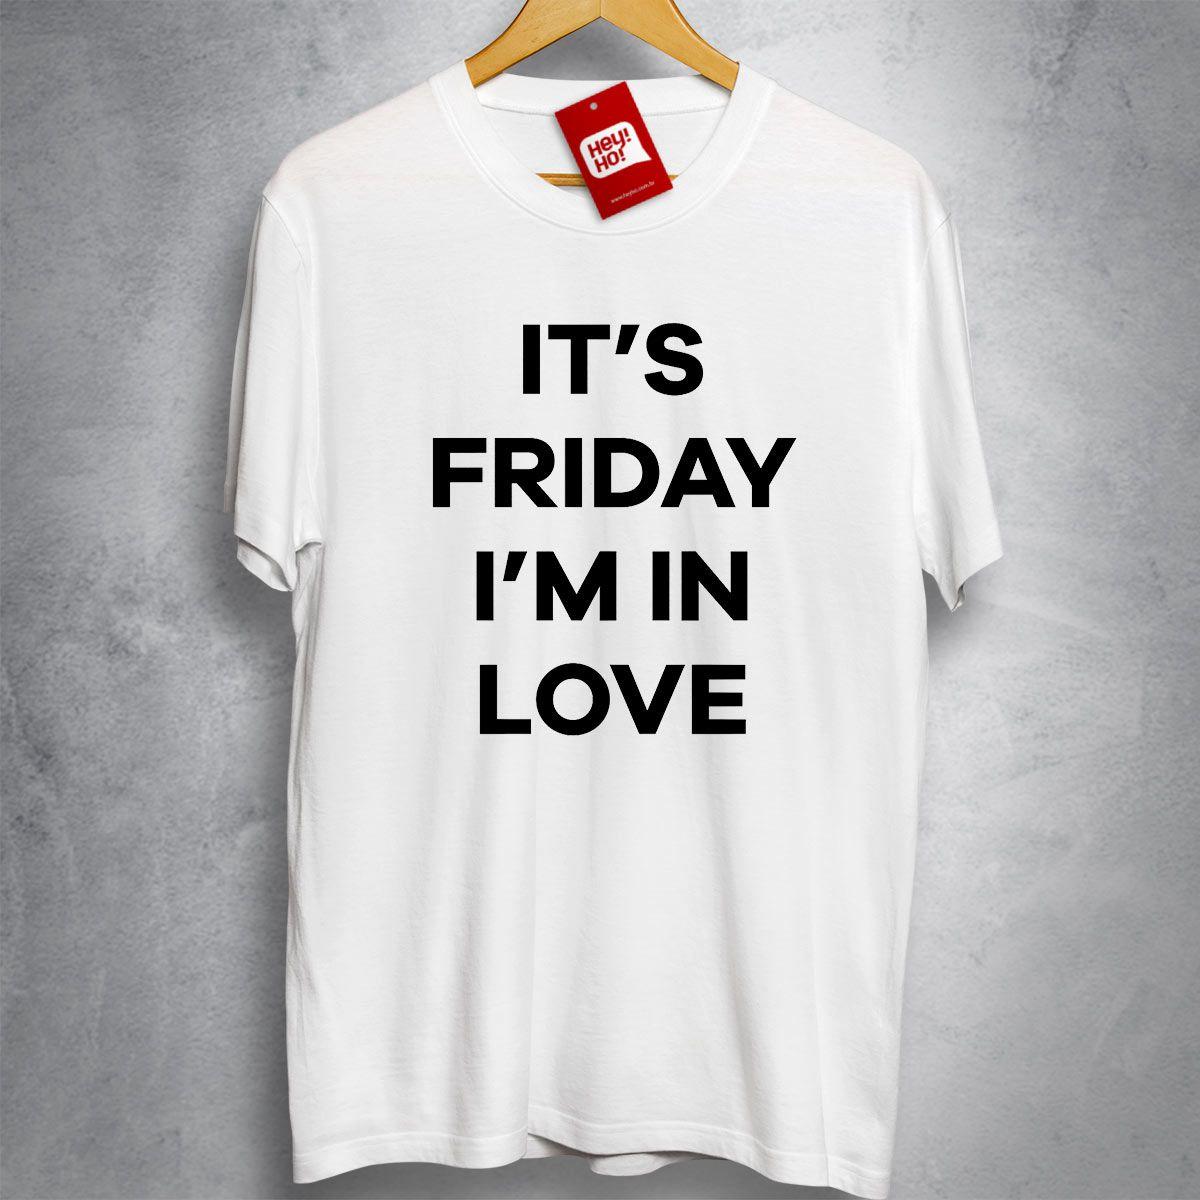 OFERTA - THE CURE - It's Friday I'm in love - Camiseta BRANCA - Tamanho M